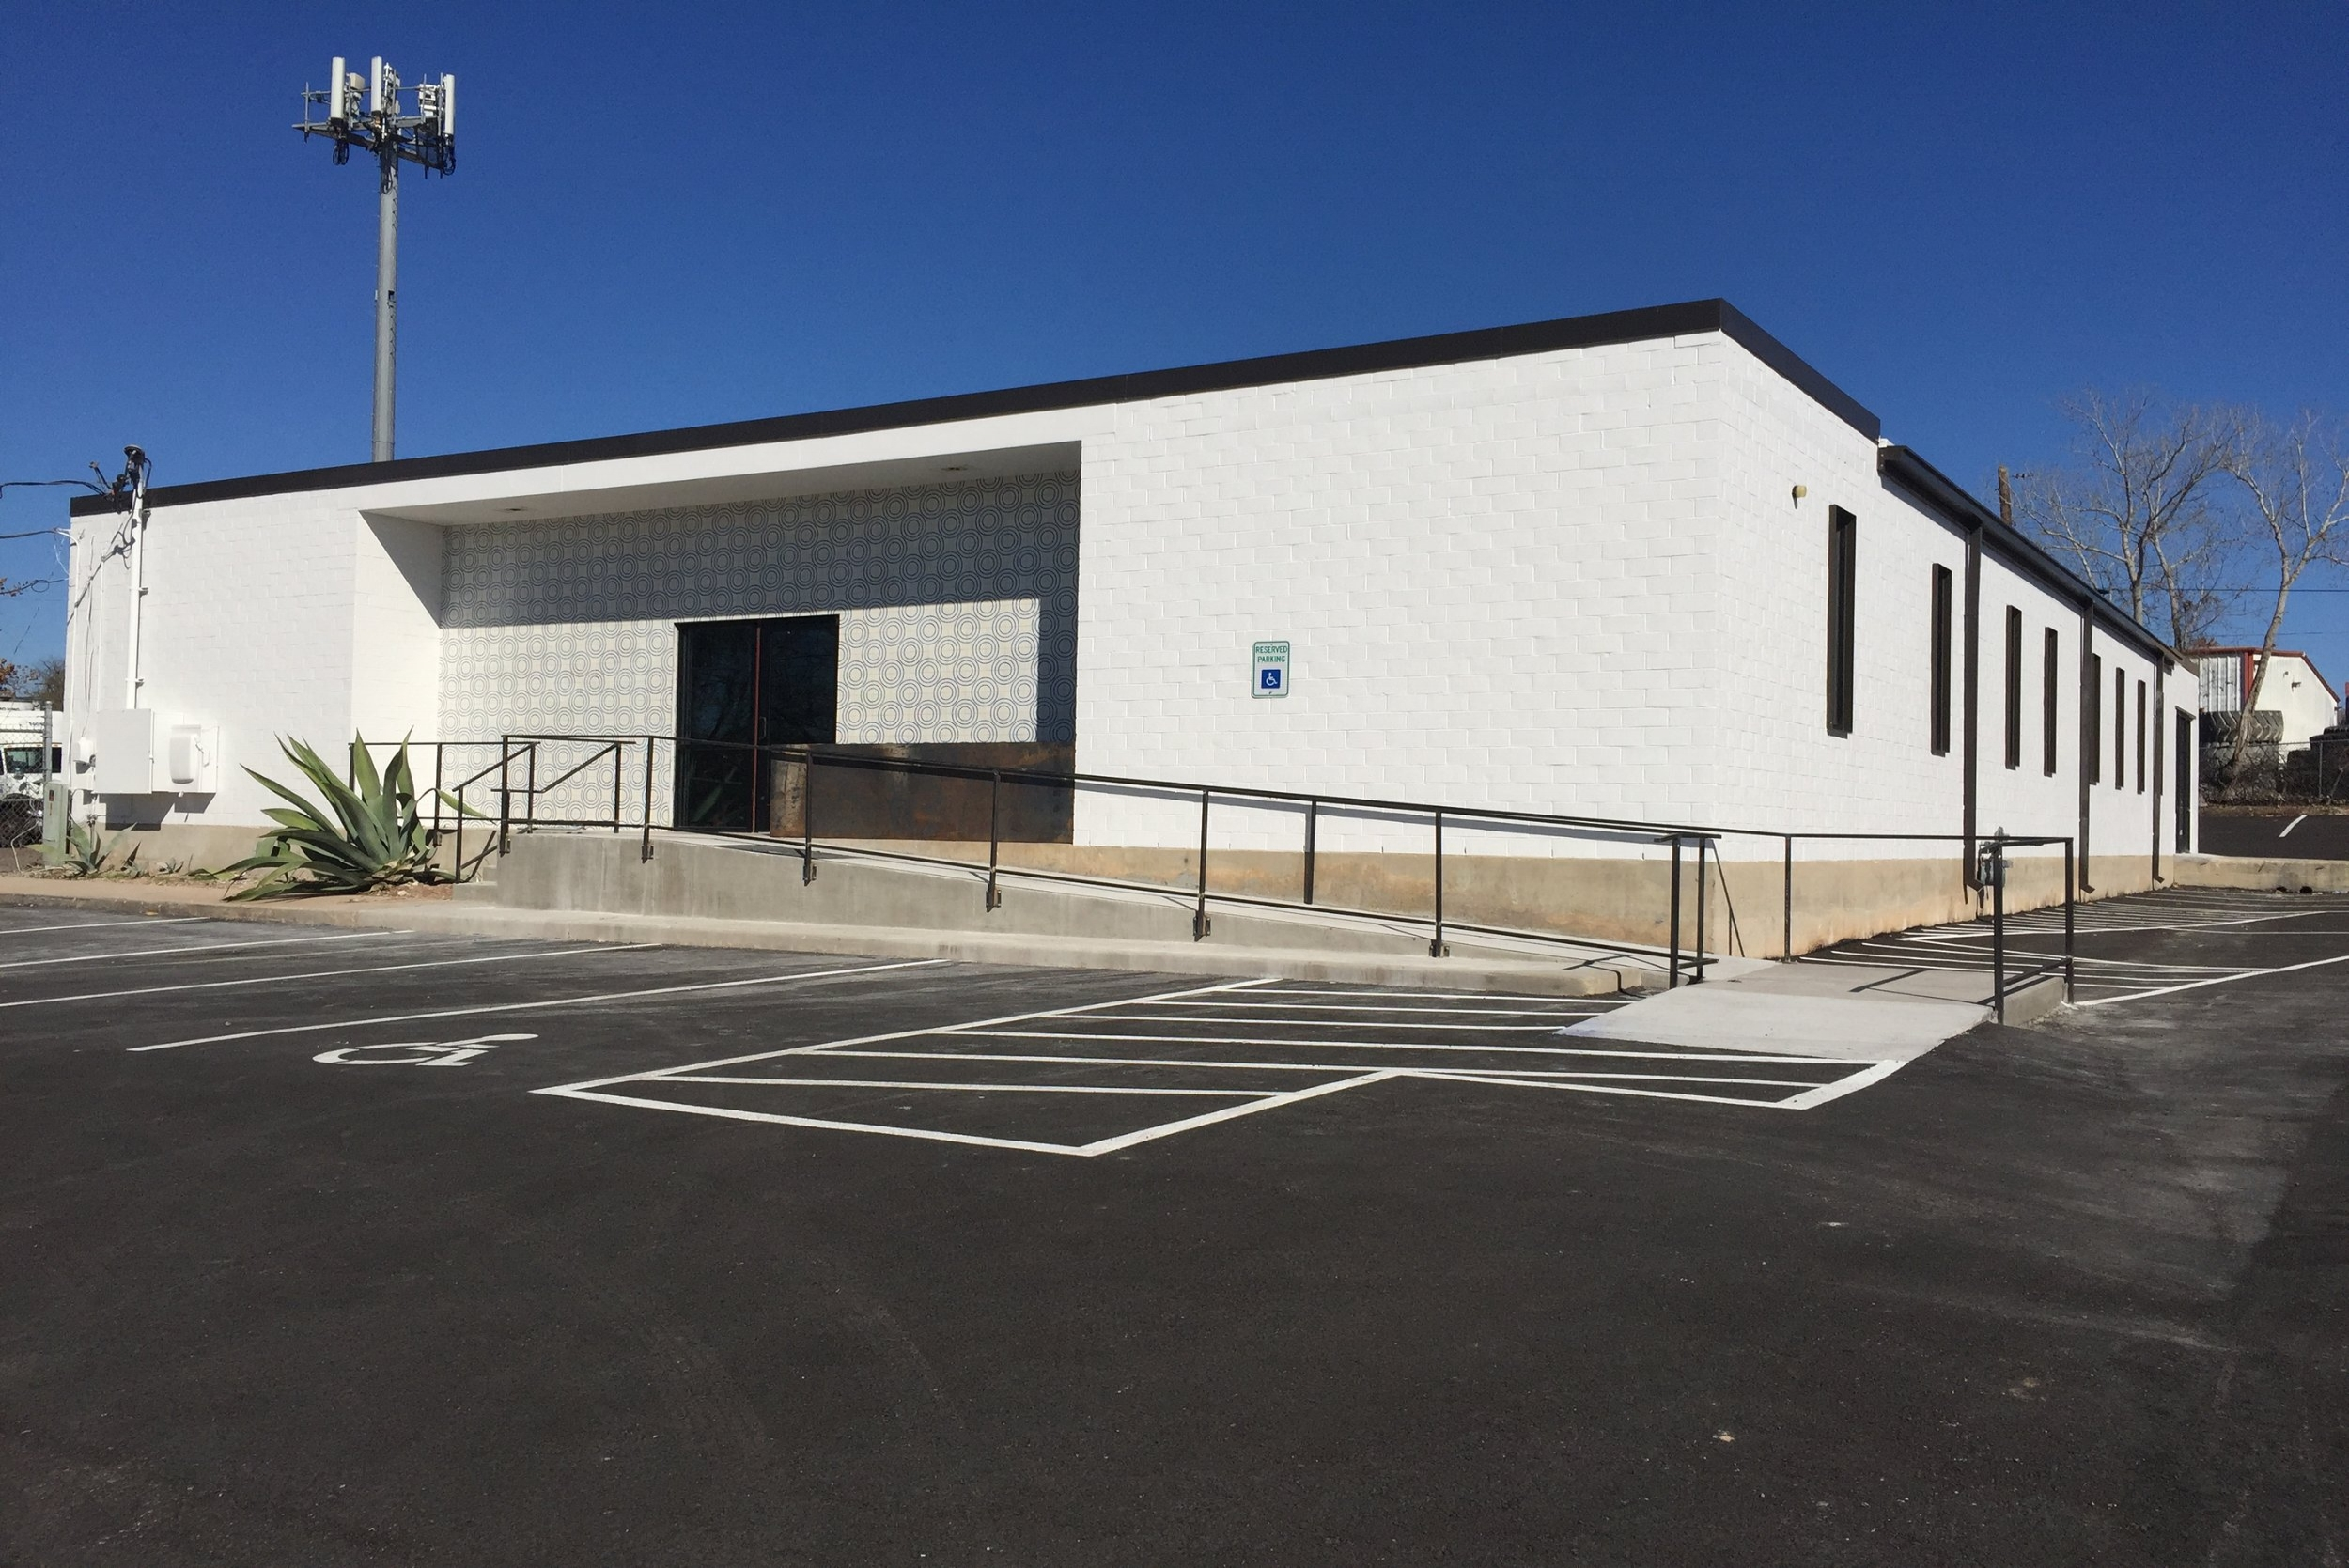 Beck-Reit Headquarters In East Austin @AustinHQ